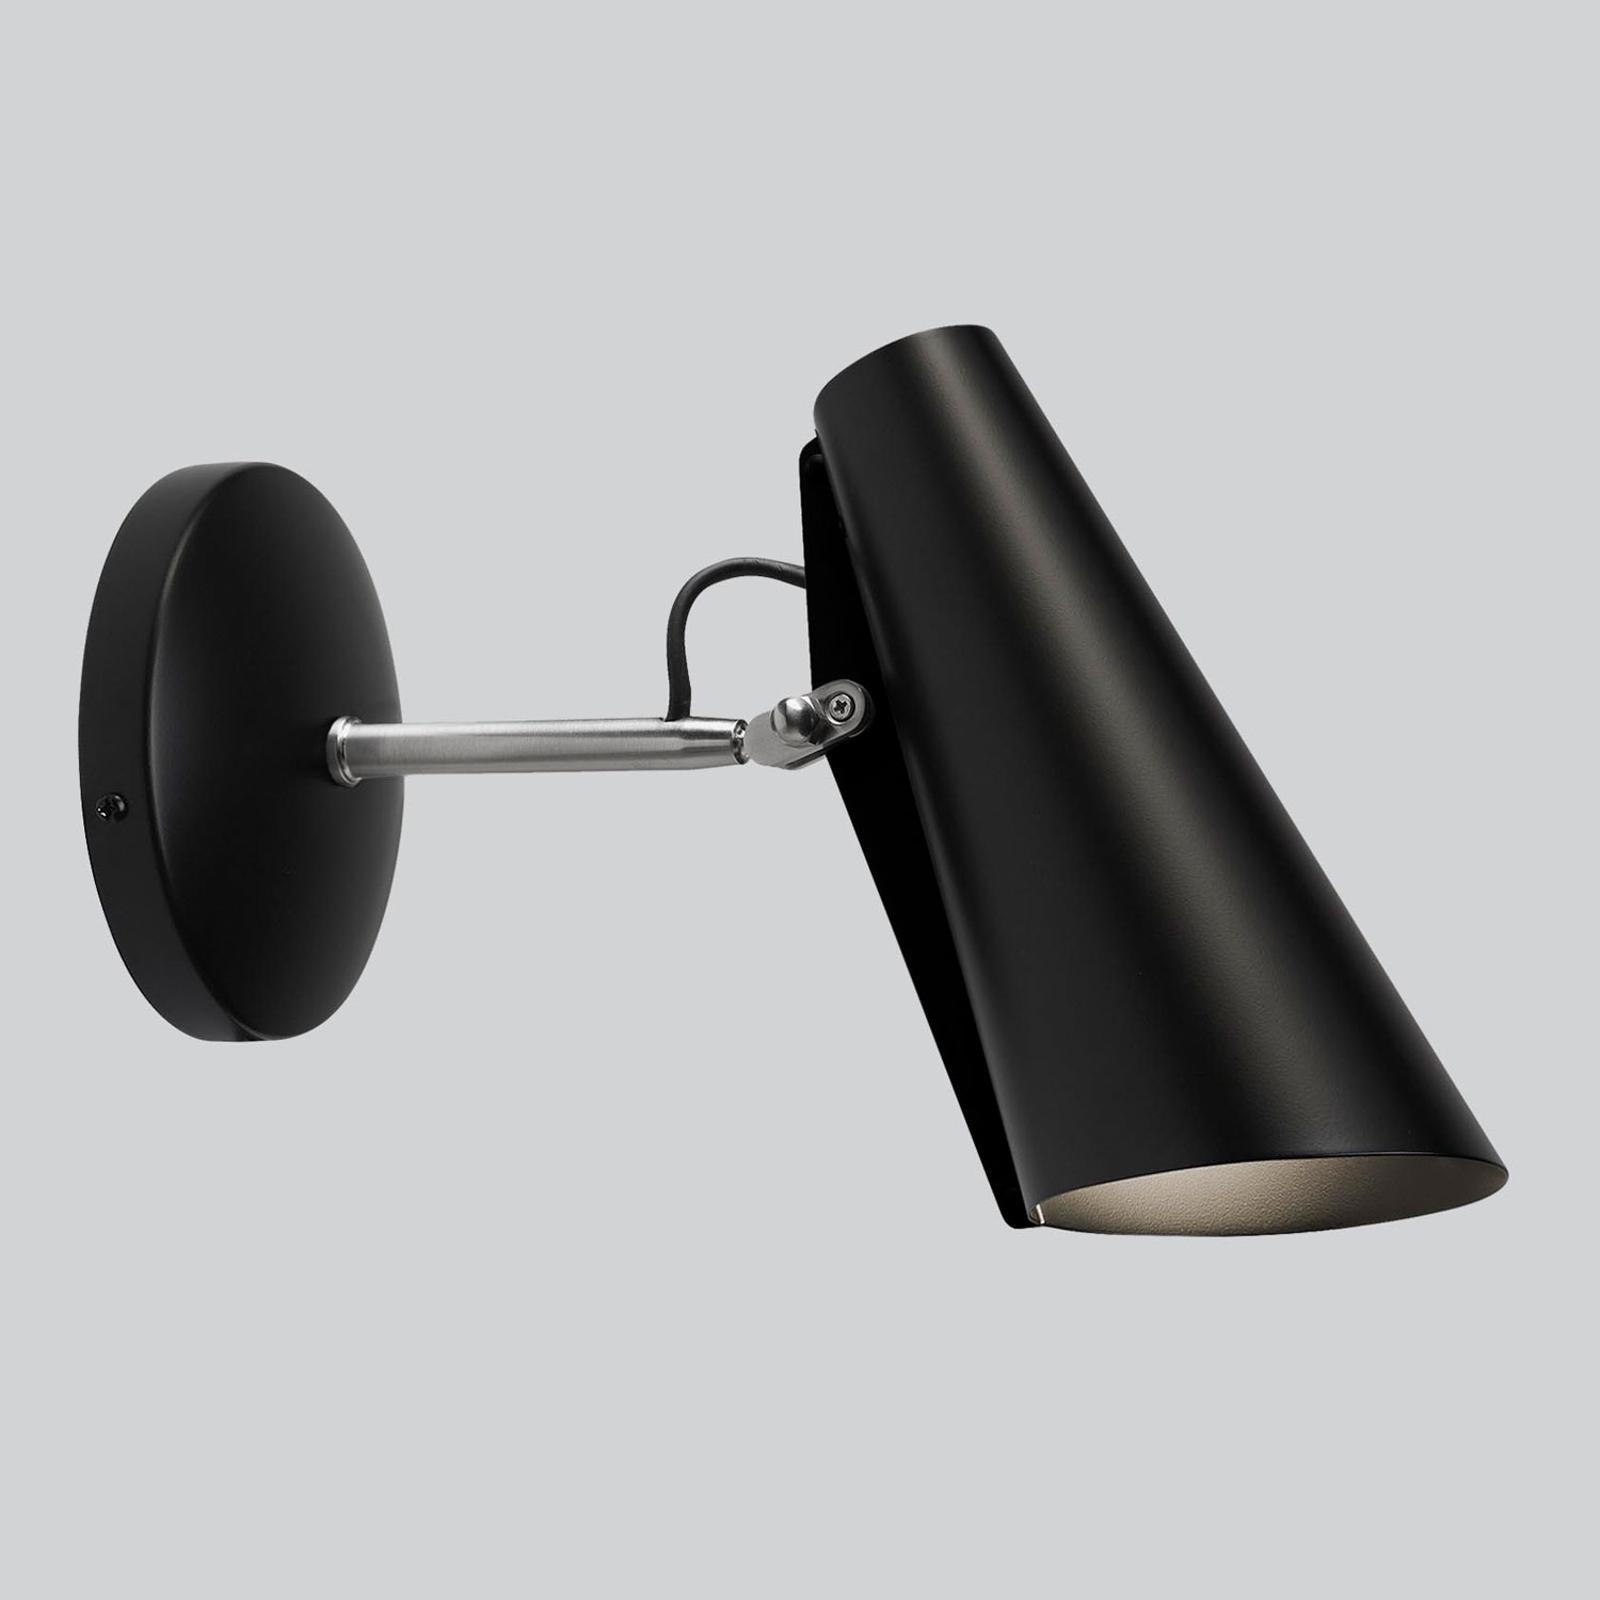 Northern Birdy - wandlamp 31,5cm zwart/staal